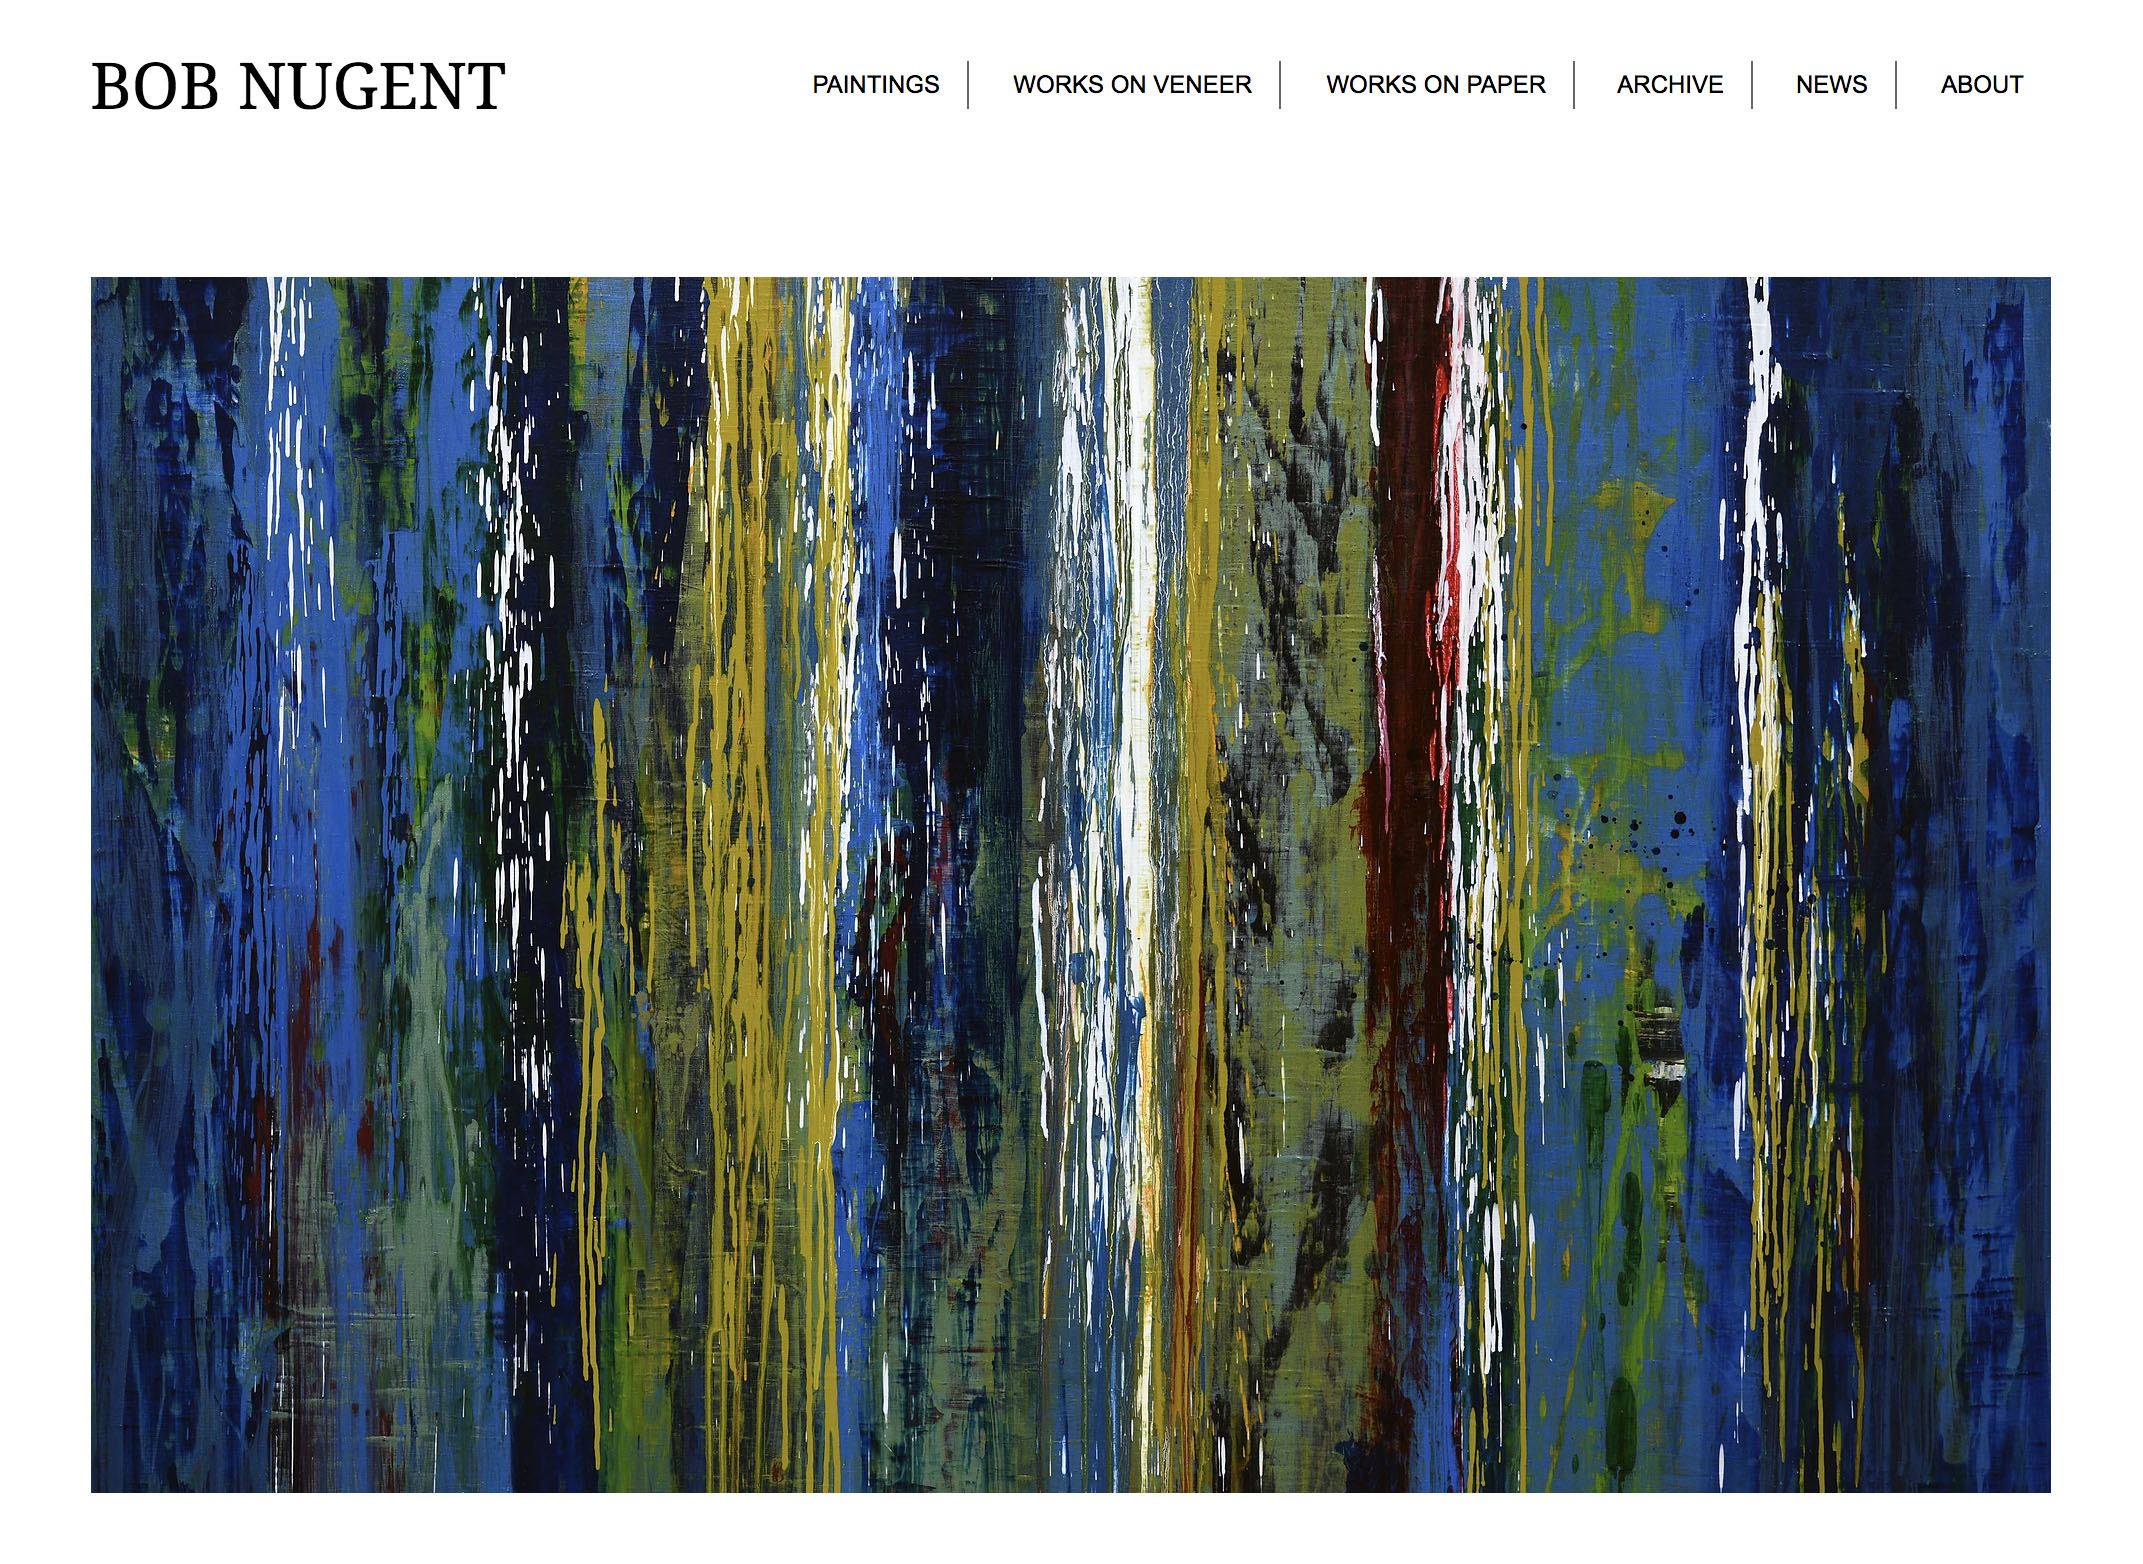 bob nugent website